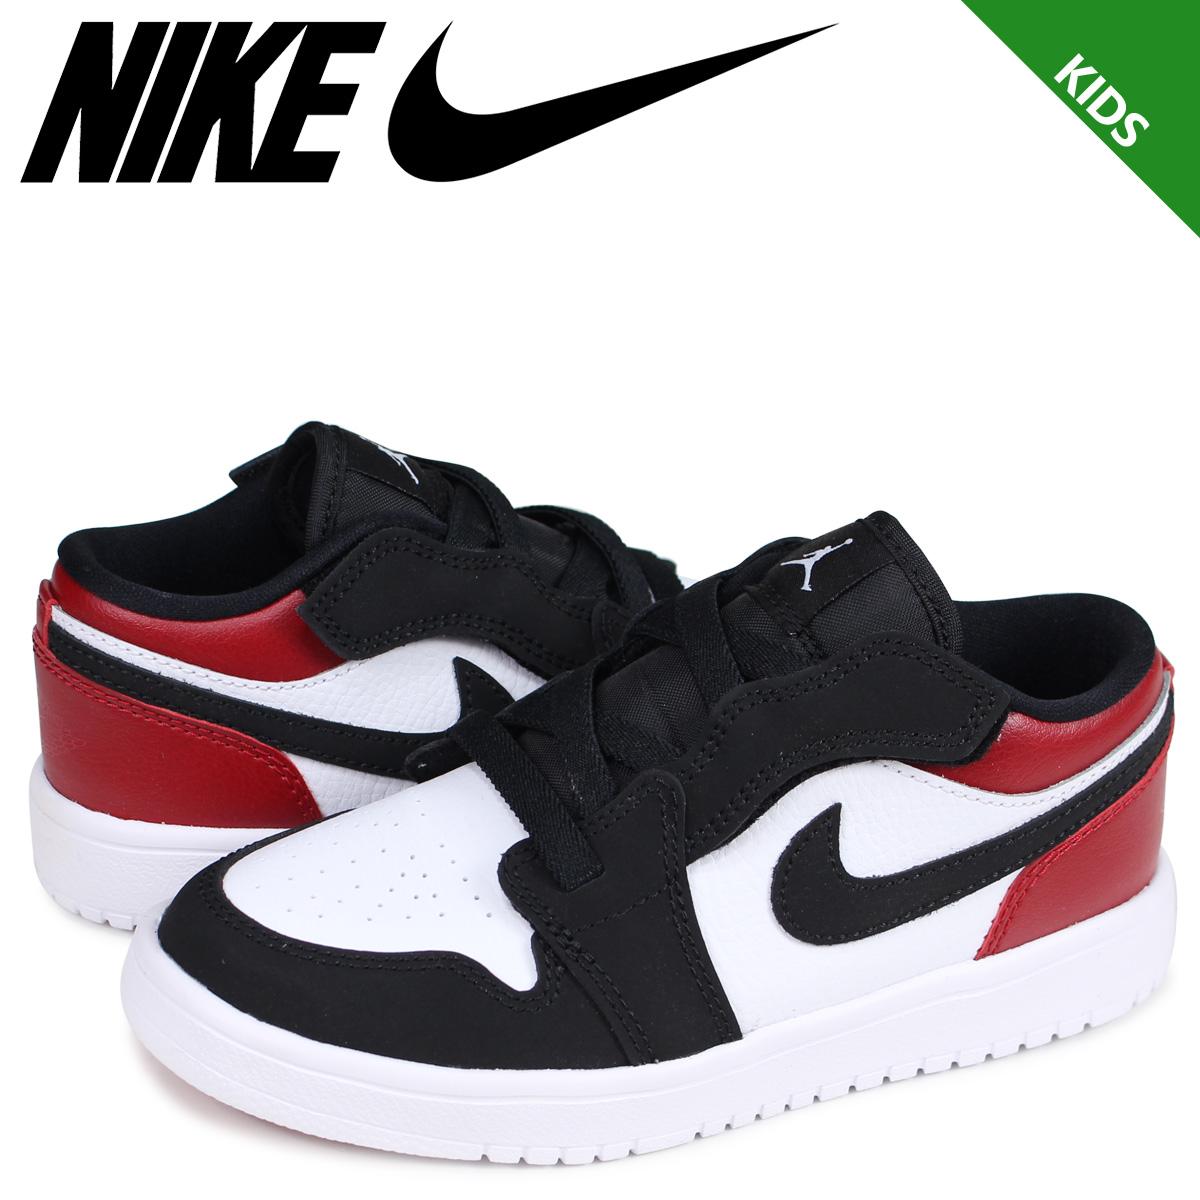 on sale 38d5f bd886 NIKE AIR JORDAN 1 LOW ALT PS BLACK TOE Nike Air Jordan 1 sneakers kids つま  black white white BQ6066-116